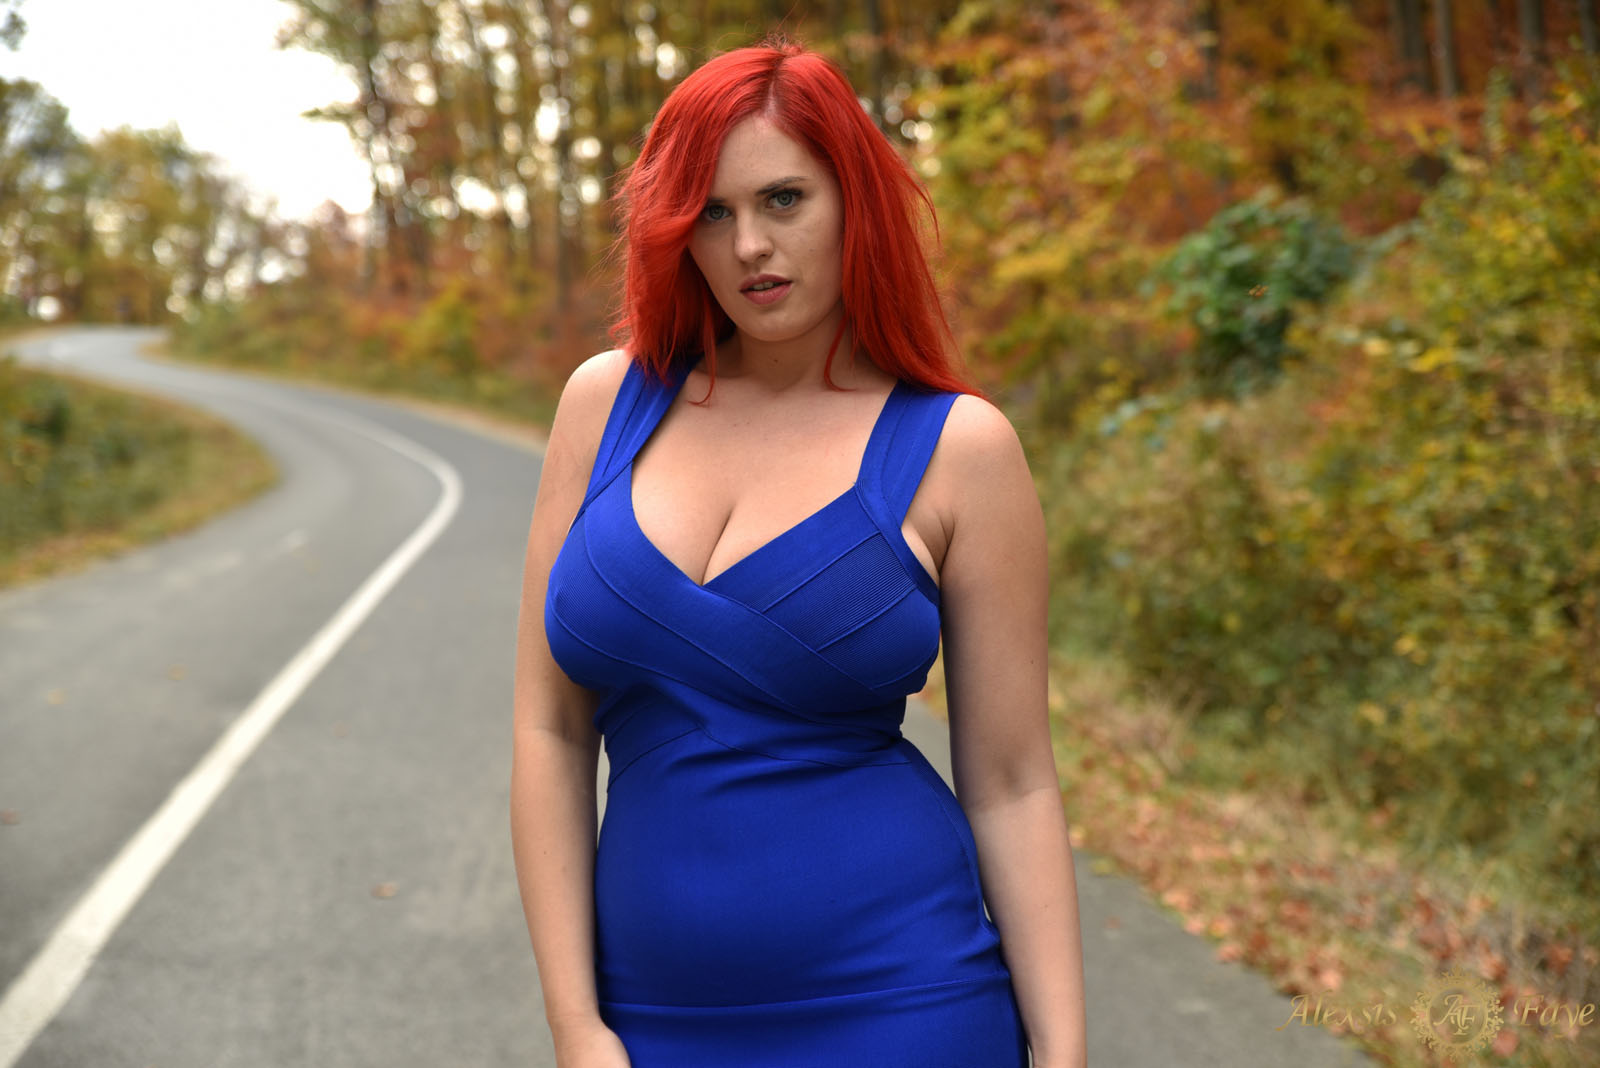 Alexsis Faye New Car Smell - Curvy Erotic